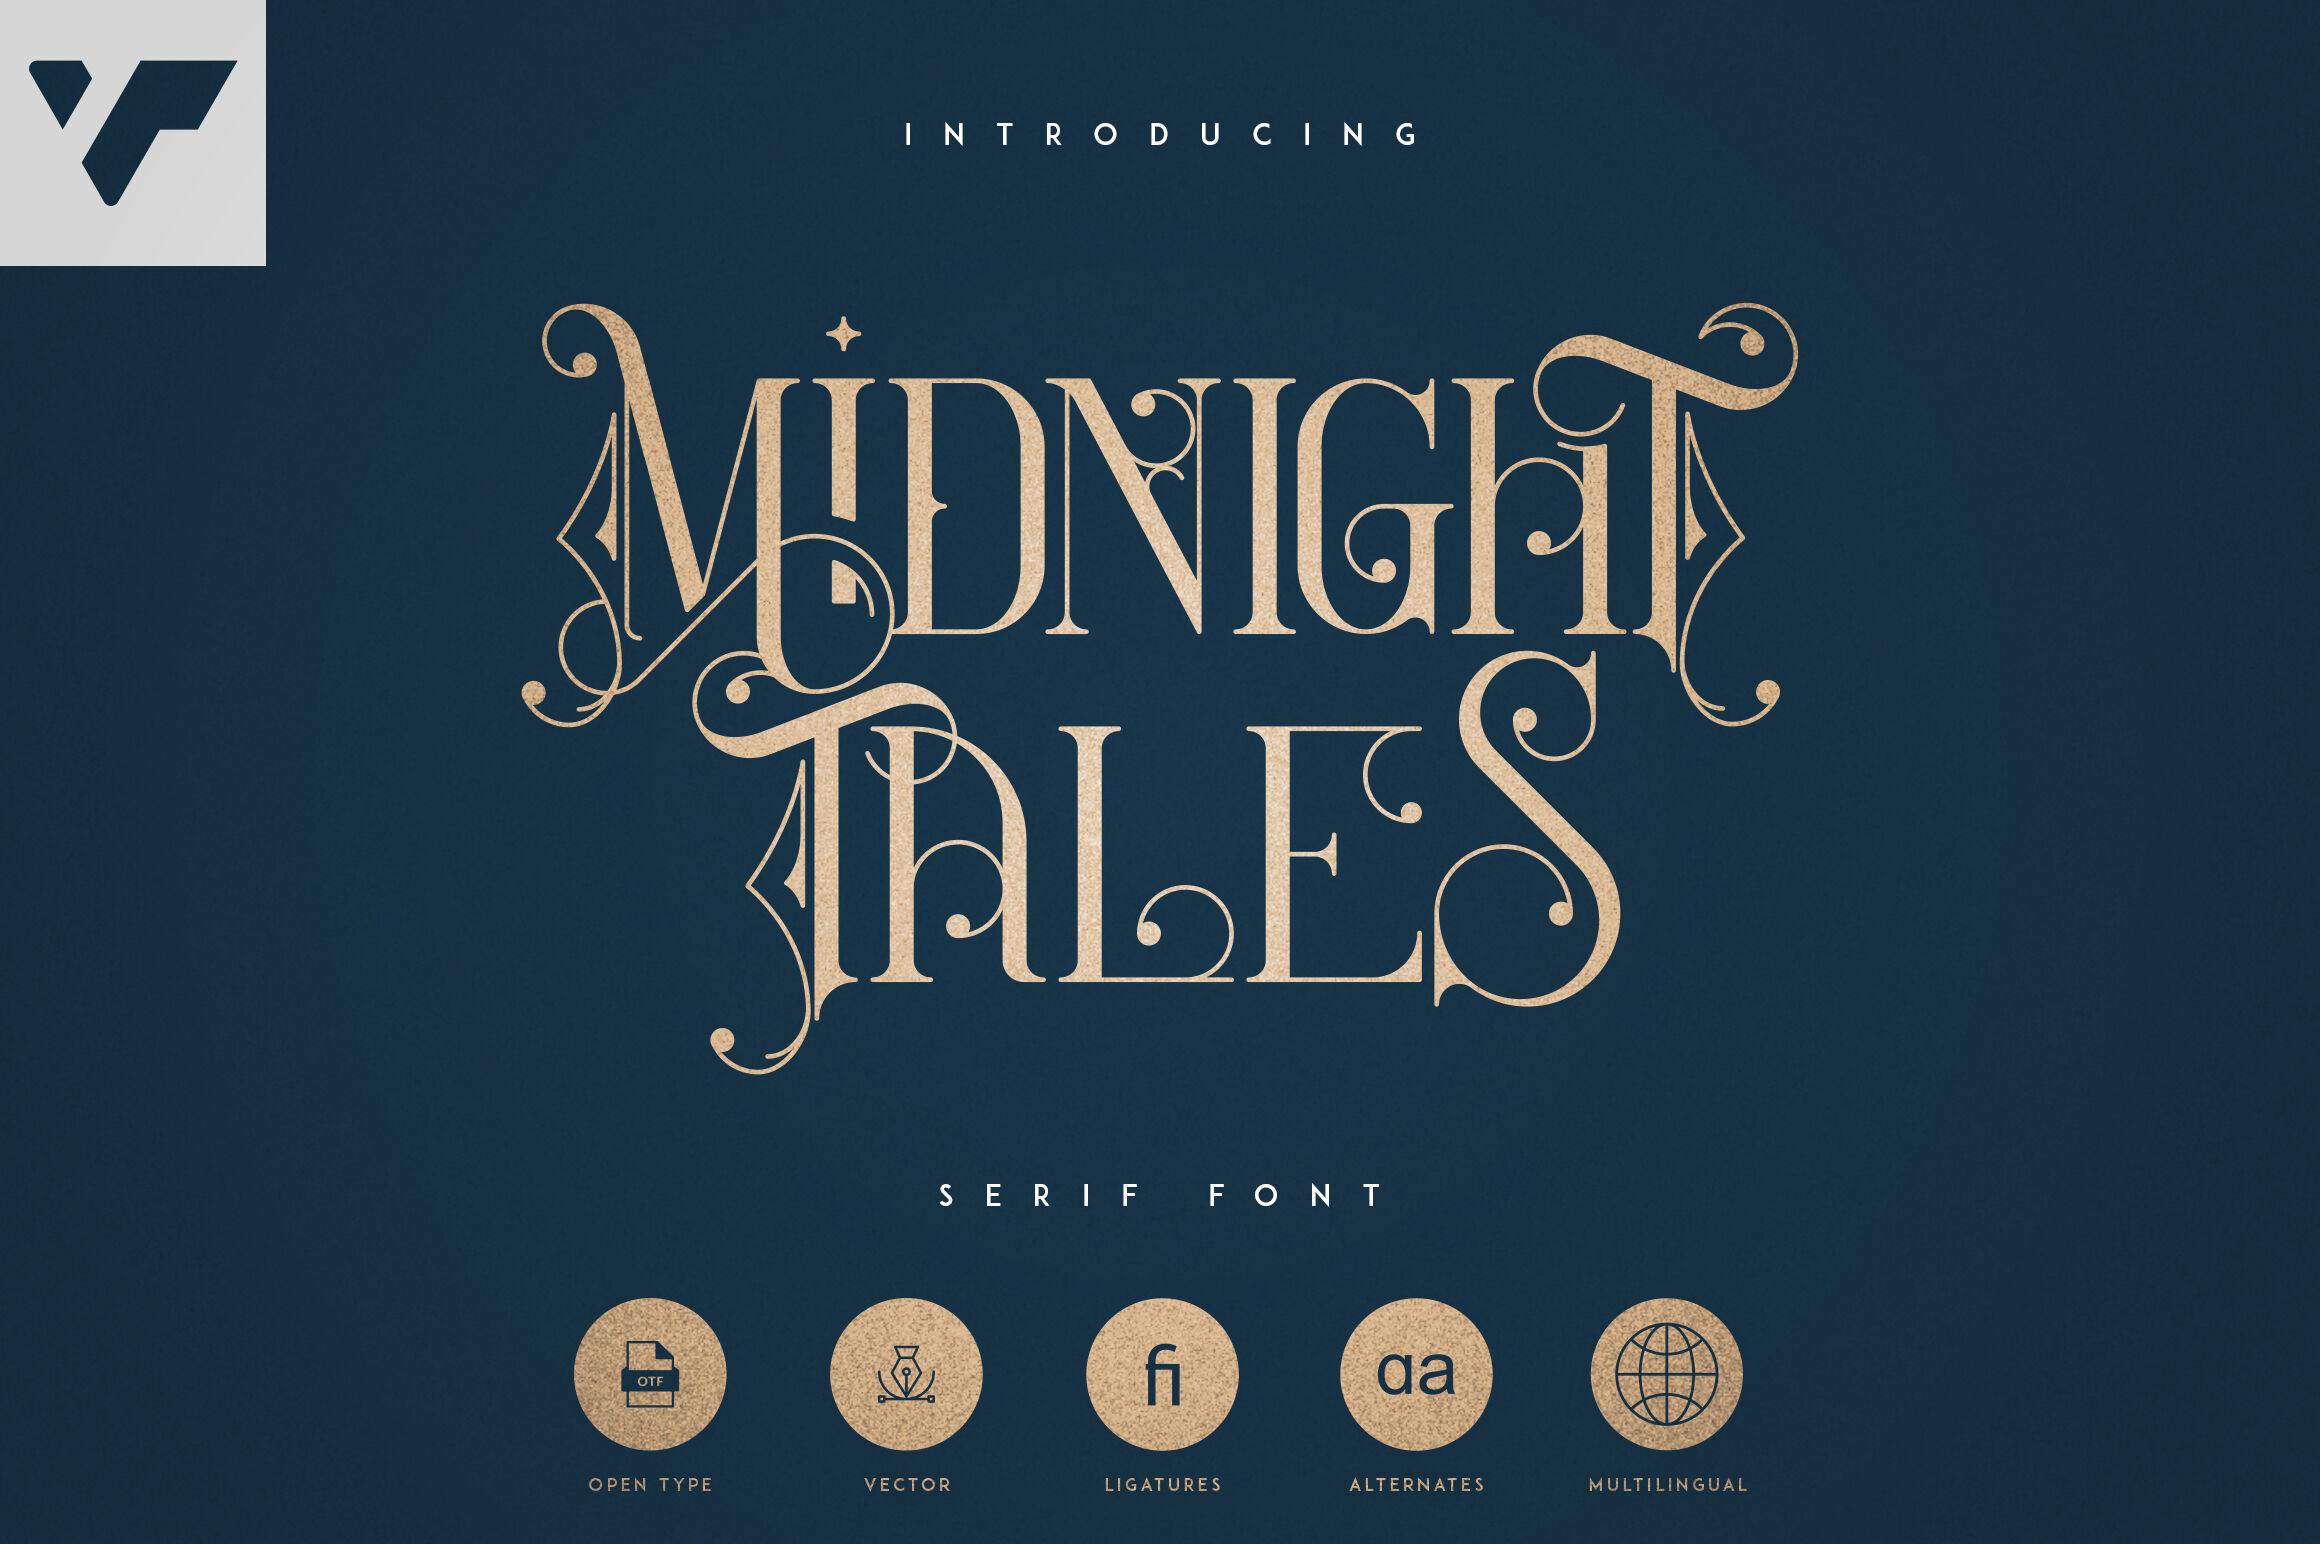 Midnight Tales Vintage Font By Vpcreativeshop Thehungryjpeg Com